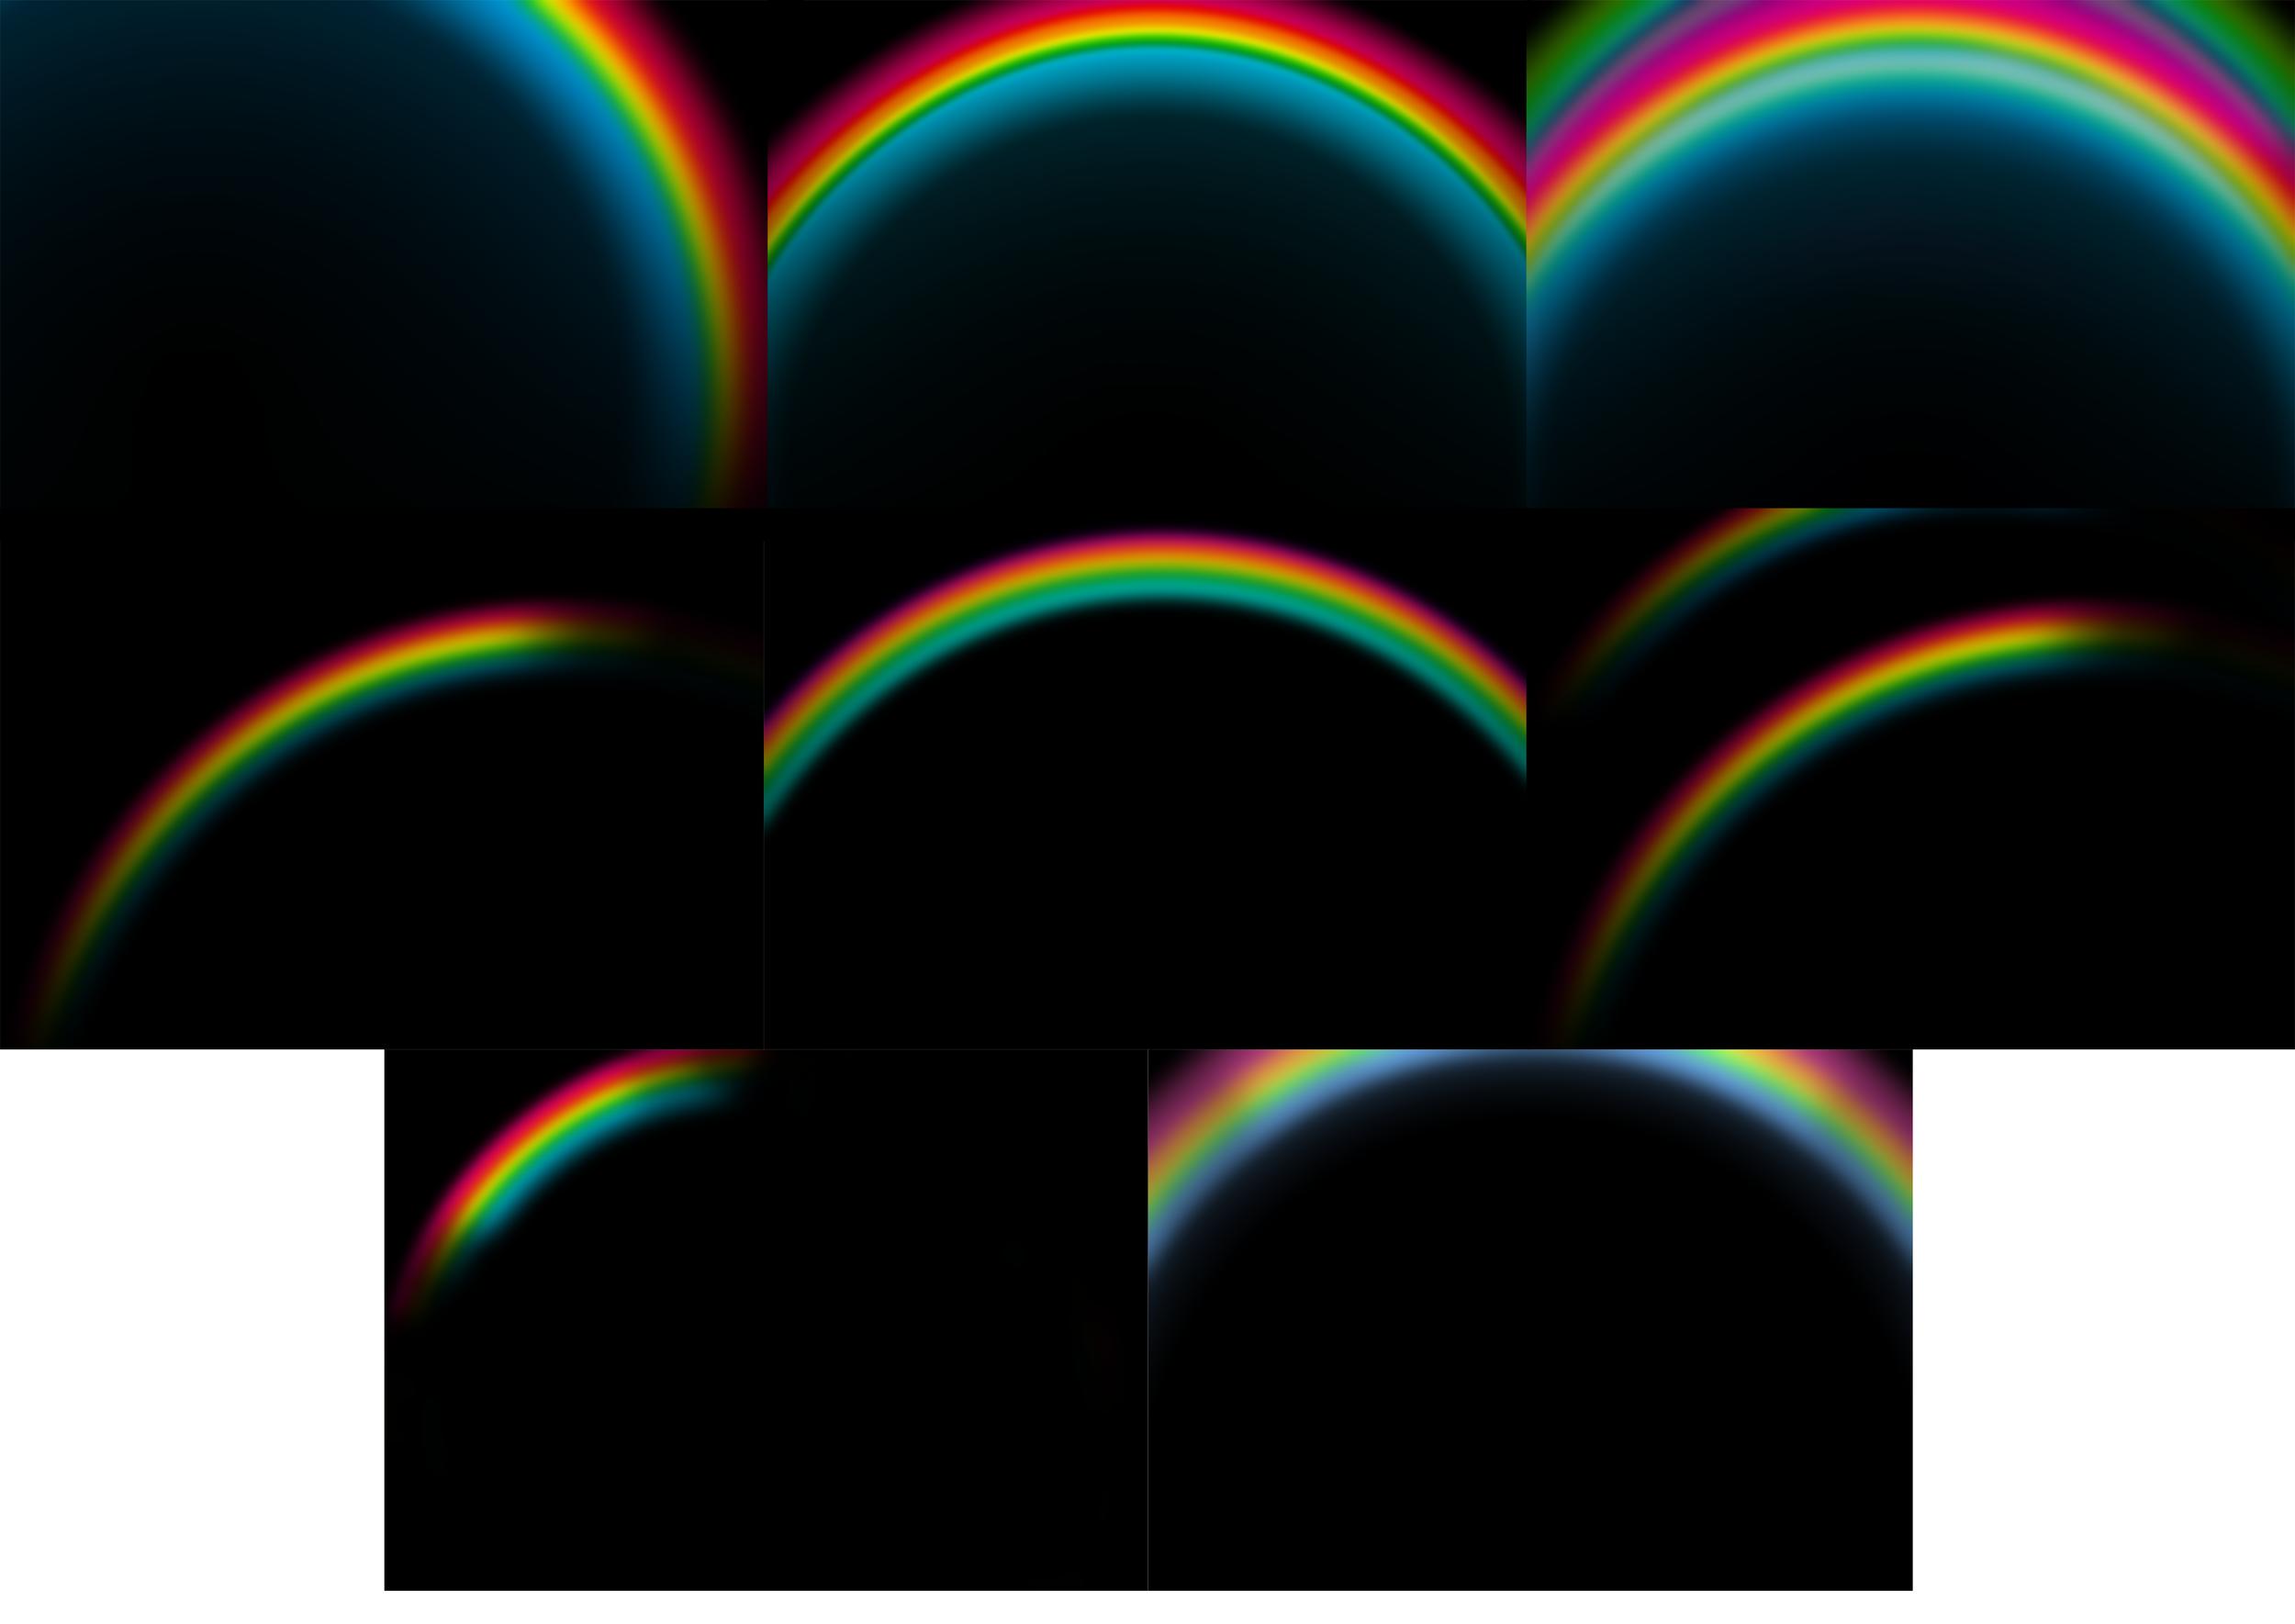 rainbow overlays